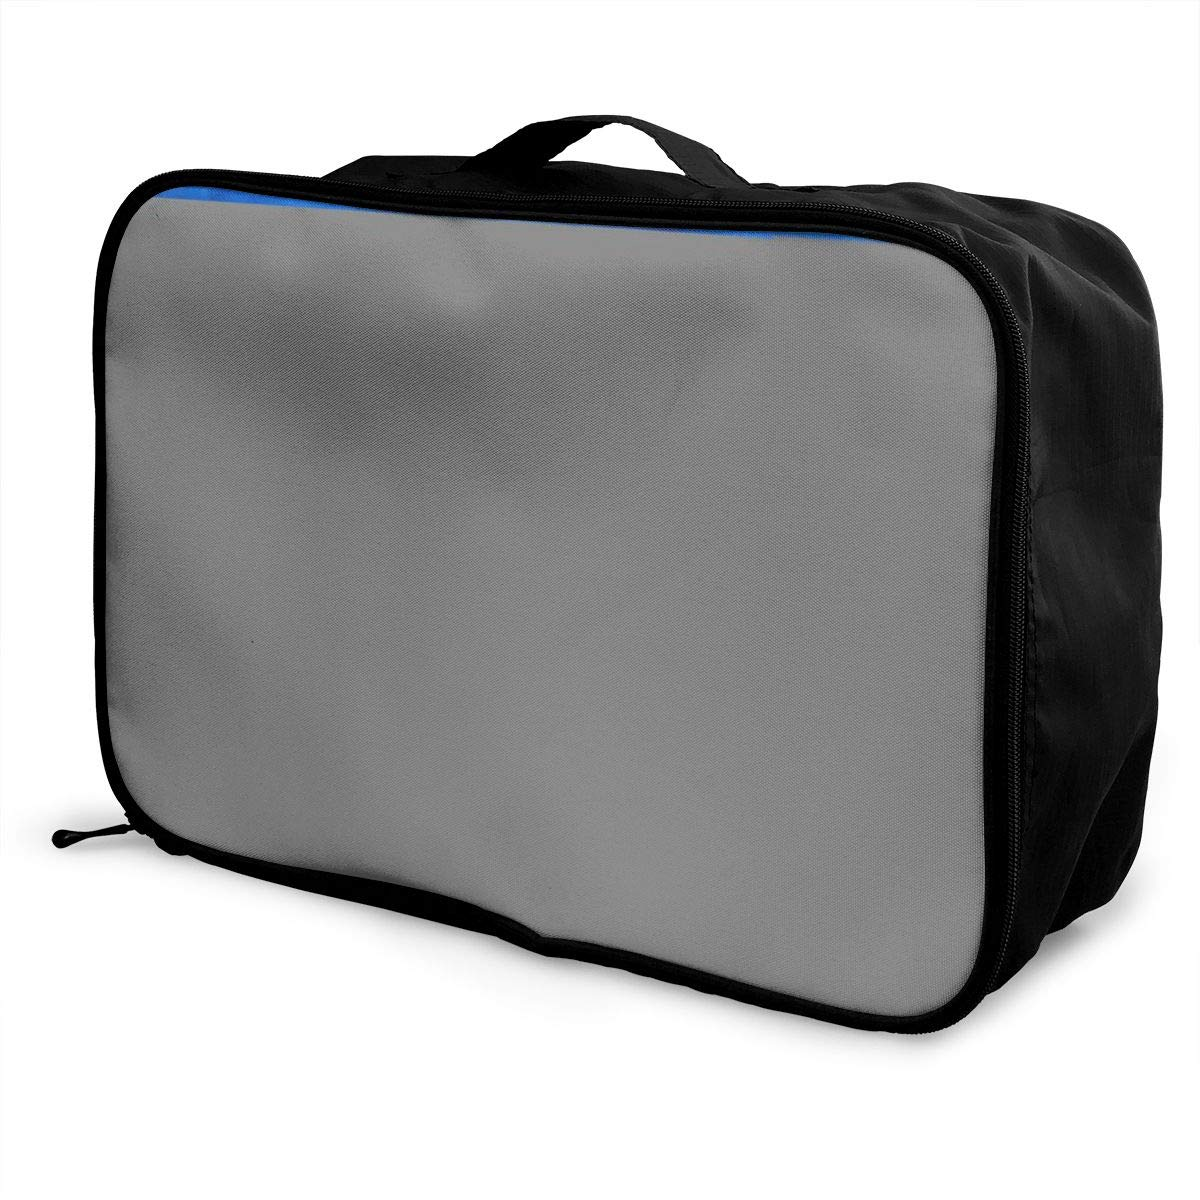 Travel Luggage Duffle Bag Lightweight Portable Handbag Cactus Pattern Large Capacity Waterproof Foldable Storage Tote